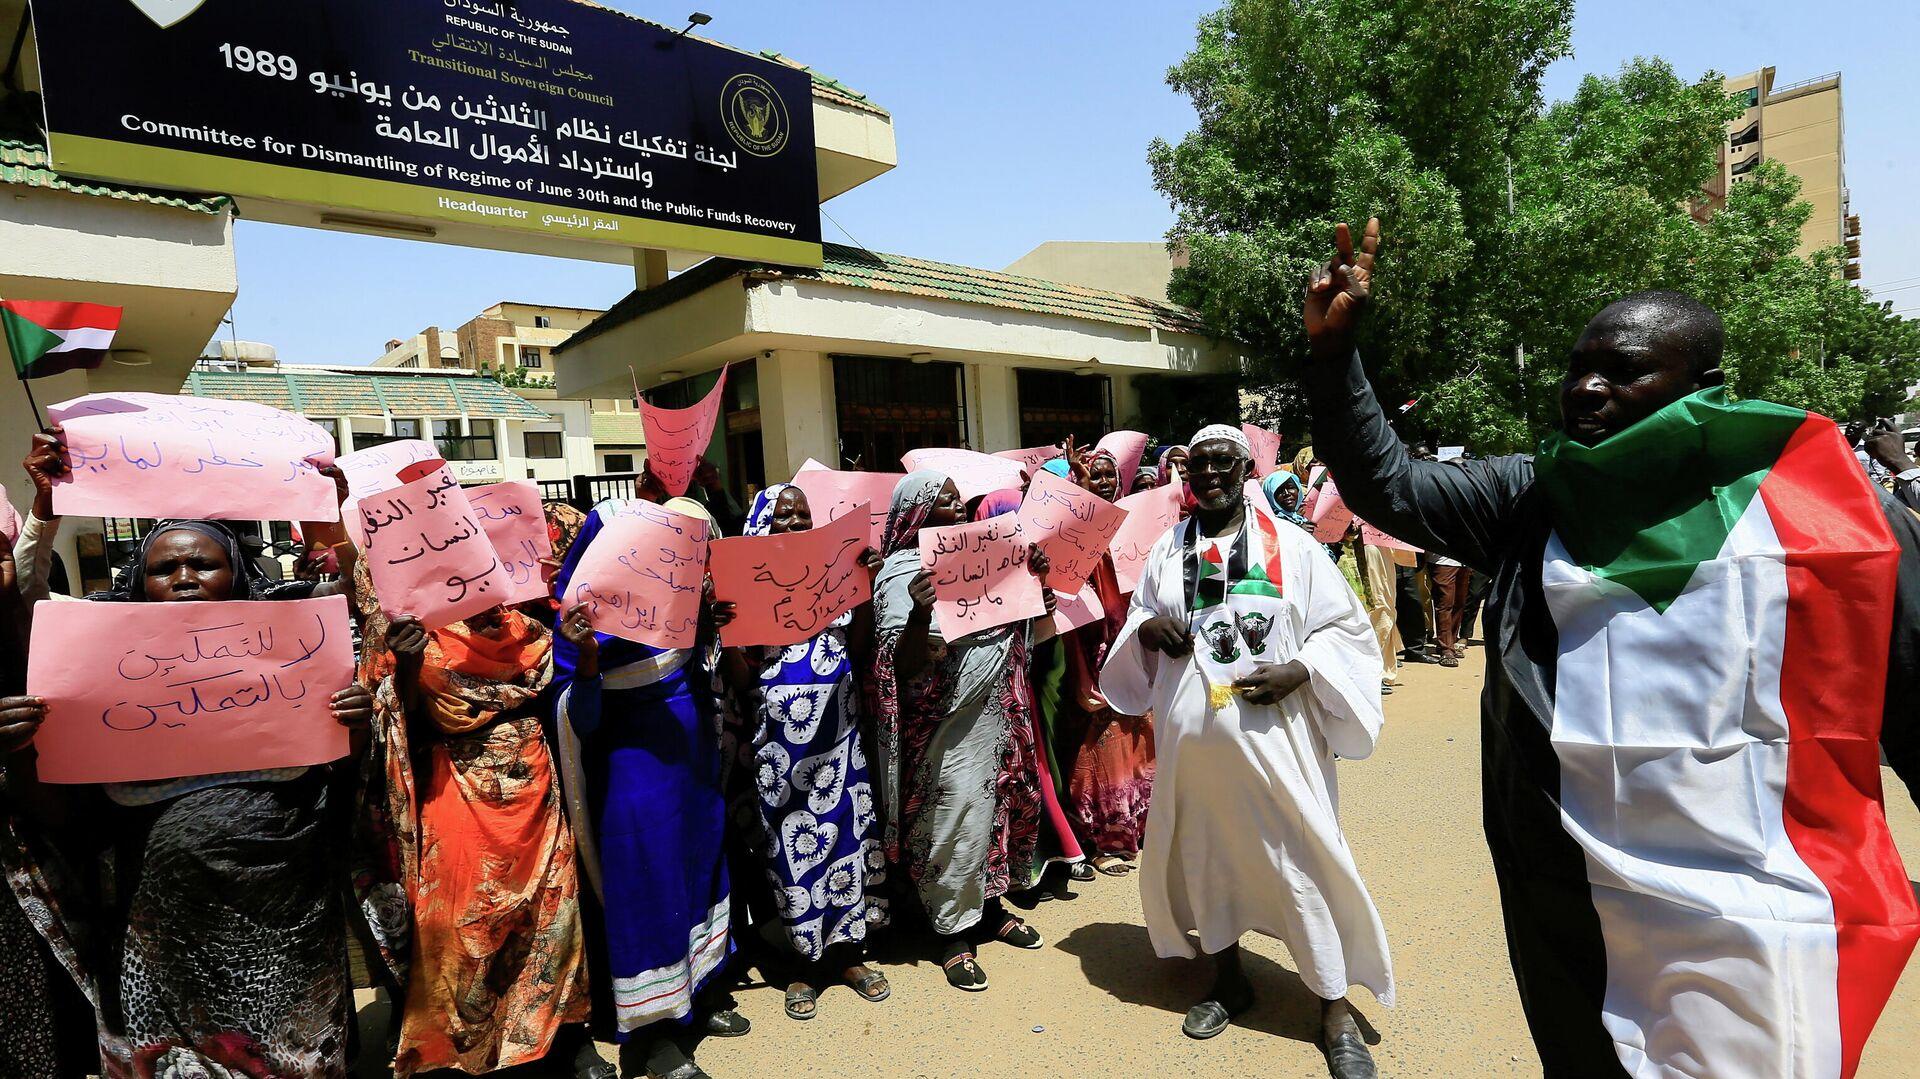 Participants of a protest in Khartoum, Sudan - 1920, 10/27/2021